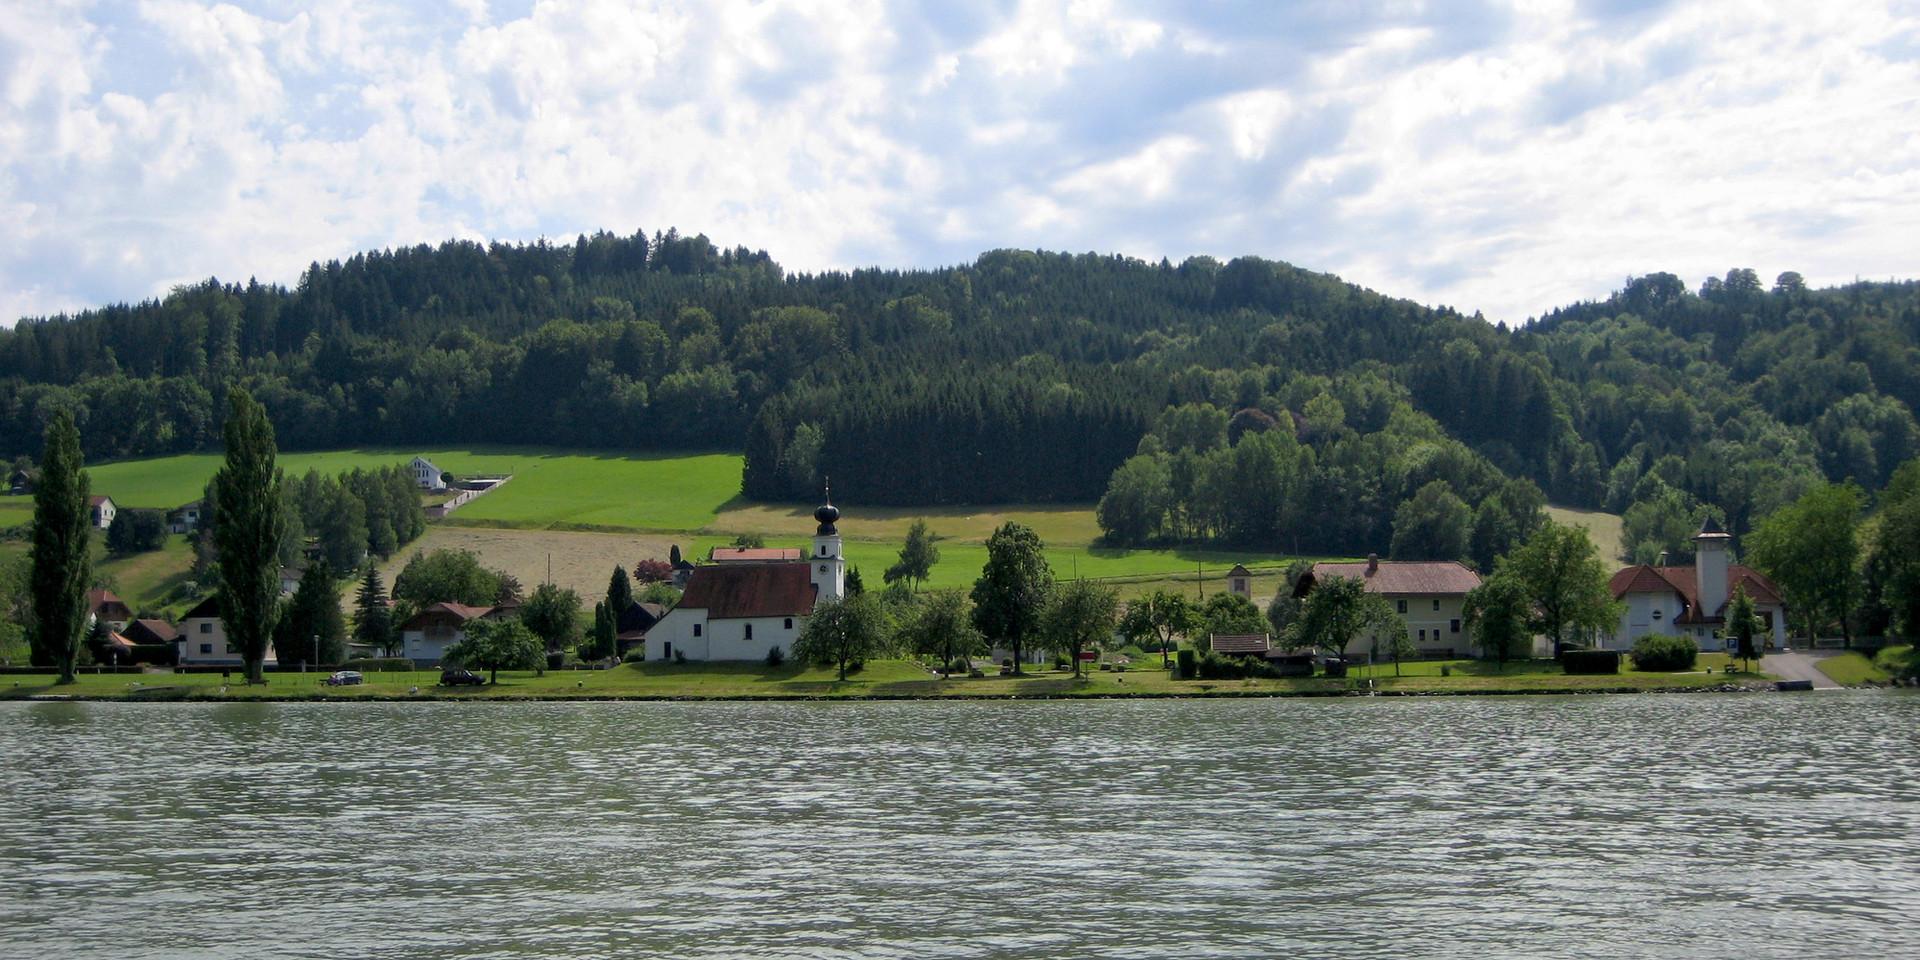 Pyrawang (Austria, Day 1)